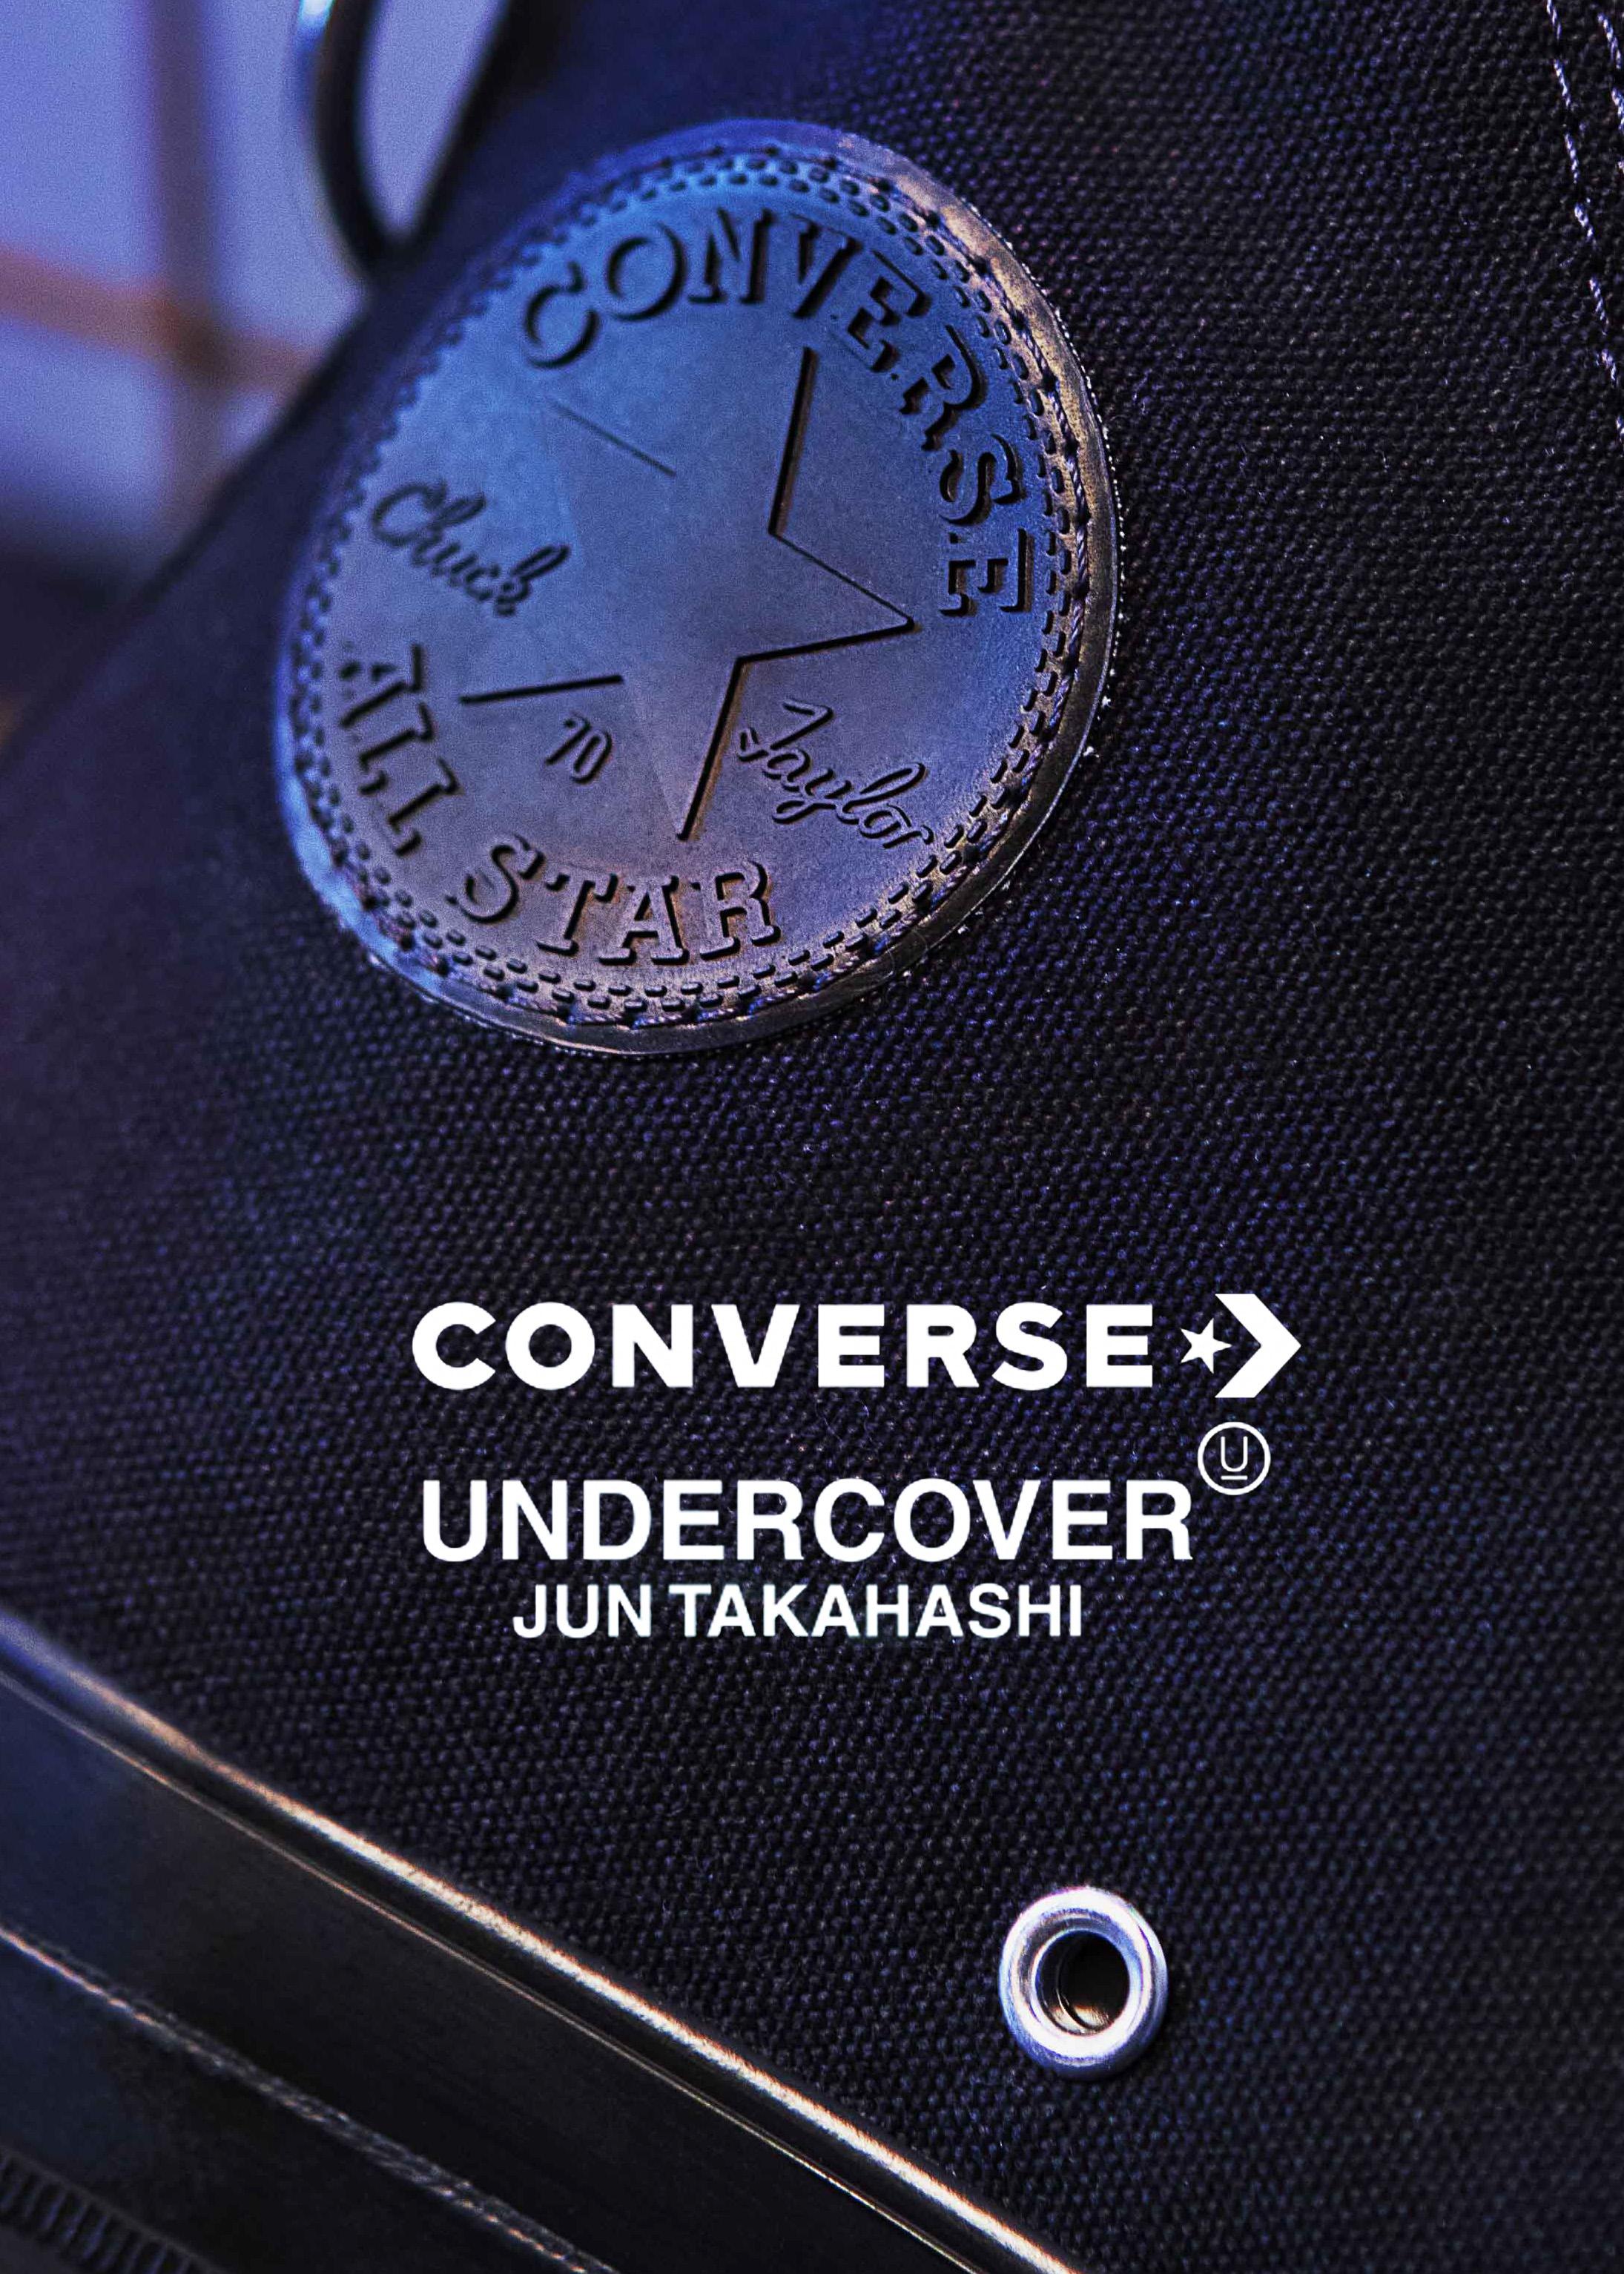 CNVS_UNDERCOVER_CHUCK-70_BLACK_DETAIL-1 copy.jpg